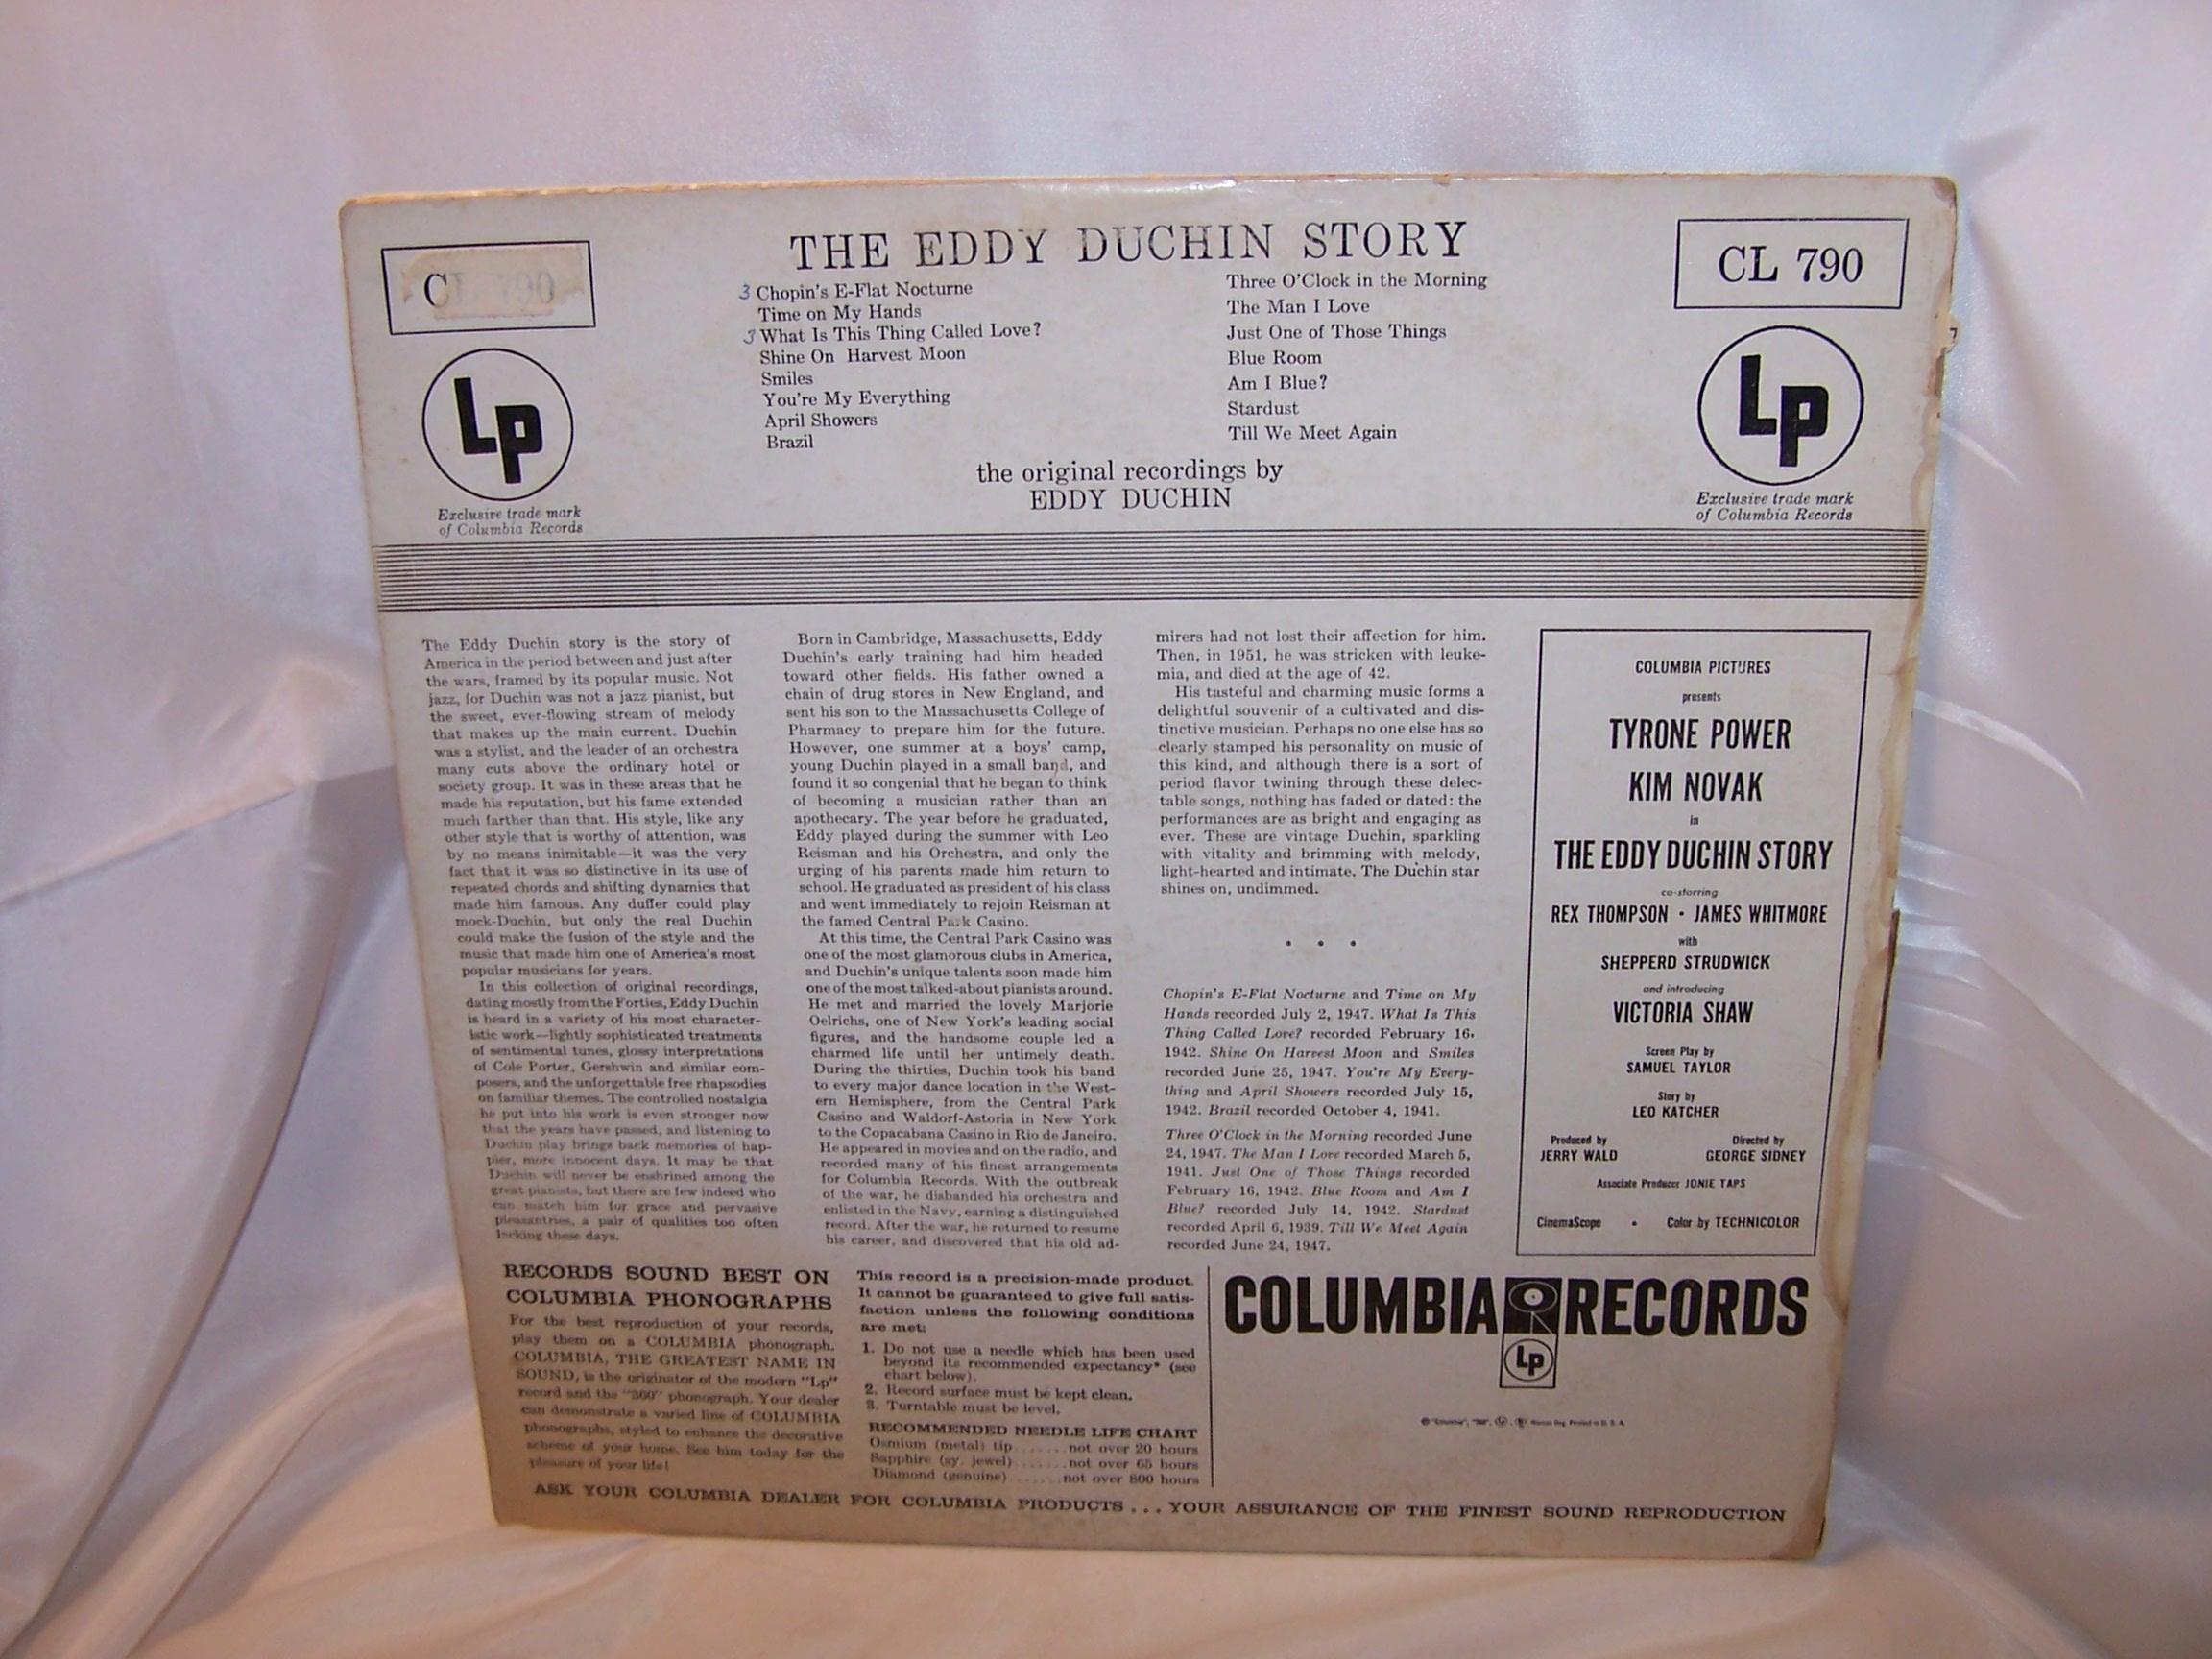 Image 1 of Eddy Duchin Story Record Album, Columbia, Tyrone Power